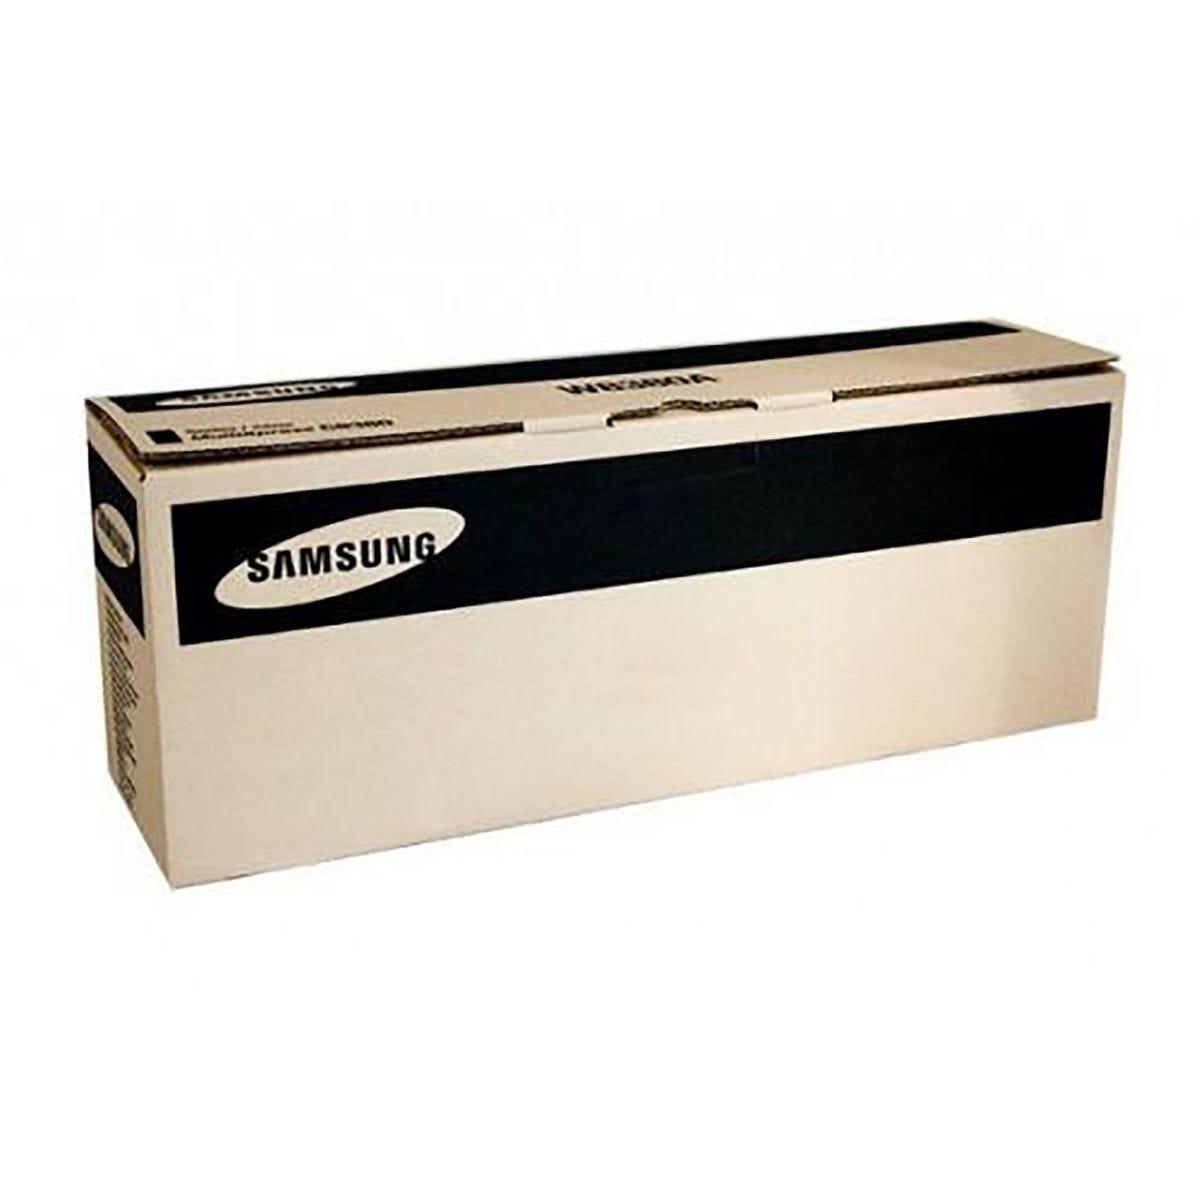 Samsung SLC430 C430W Black Original Toner Cartridge